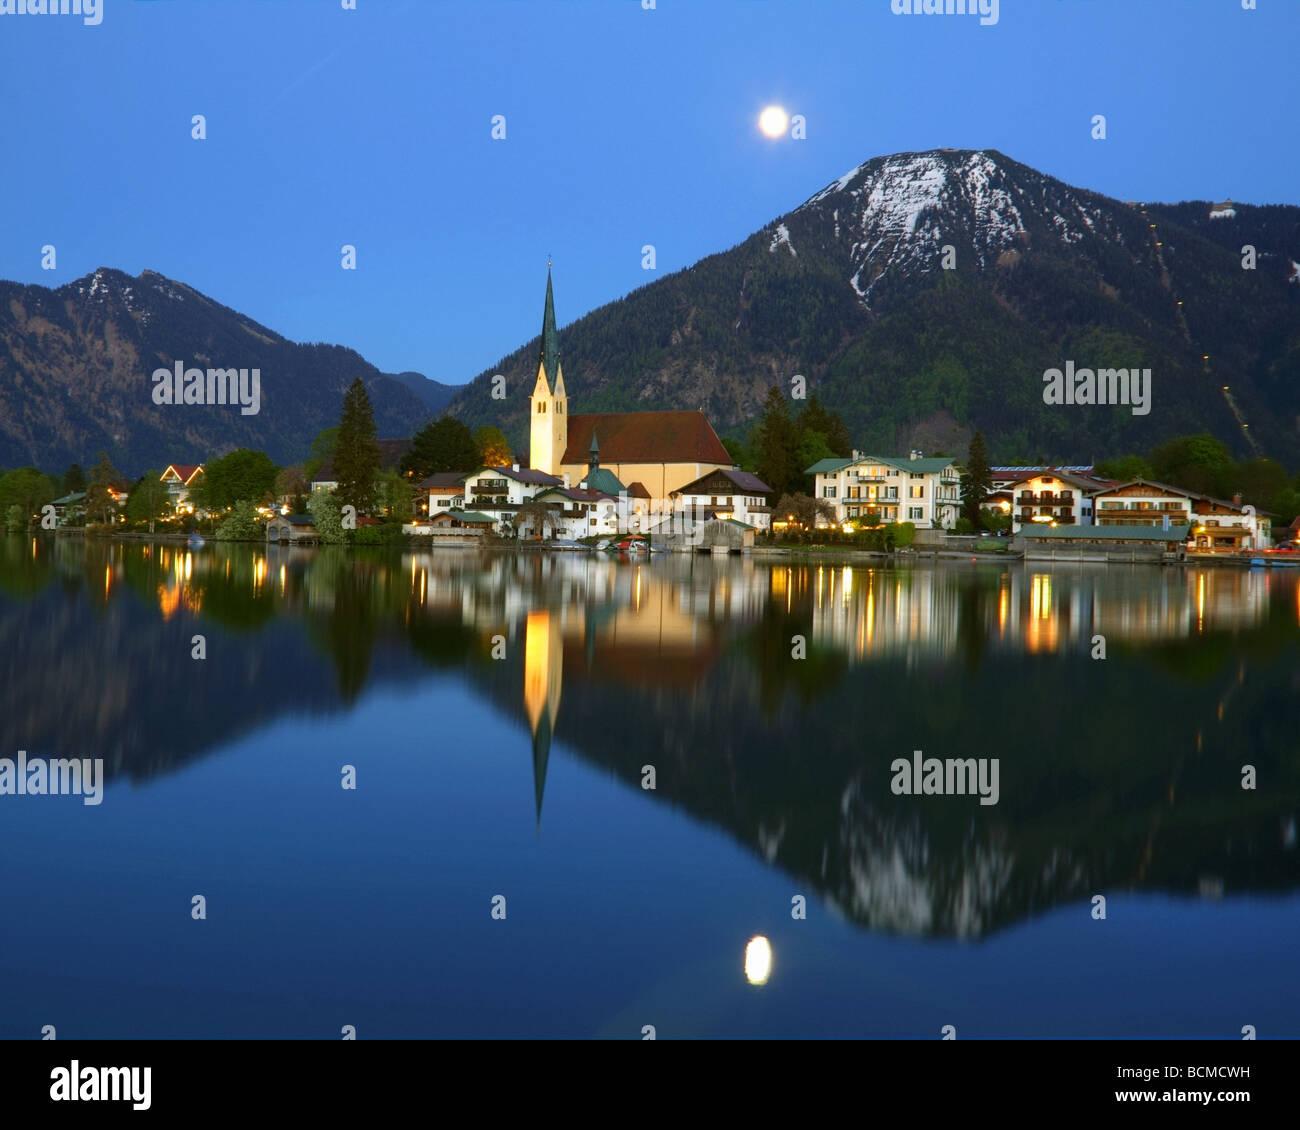 DE - BAVARIA: Rottach-Egern on Lake Tegernsee depicting Wallberg Mountain - Stock Image